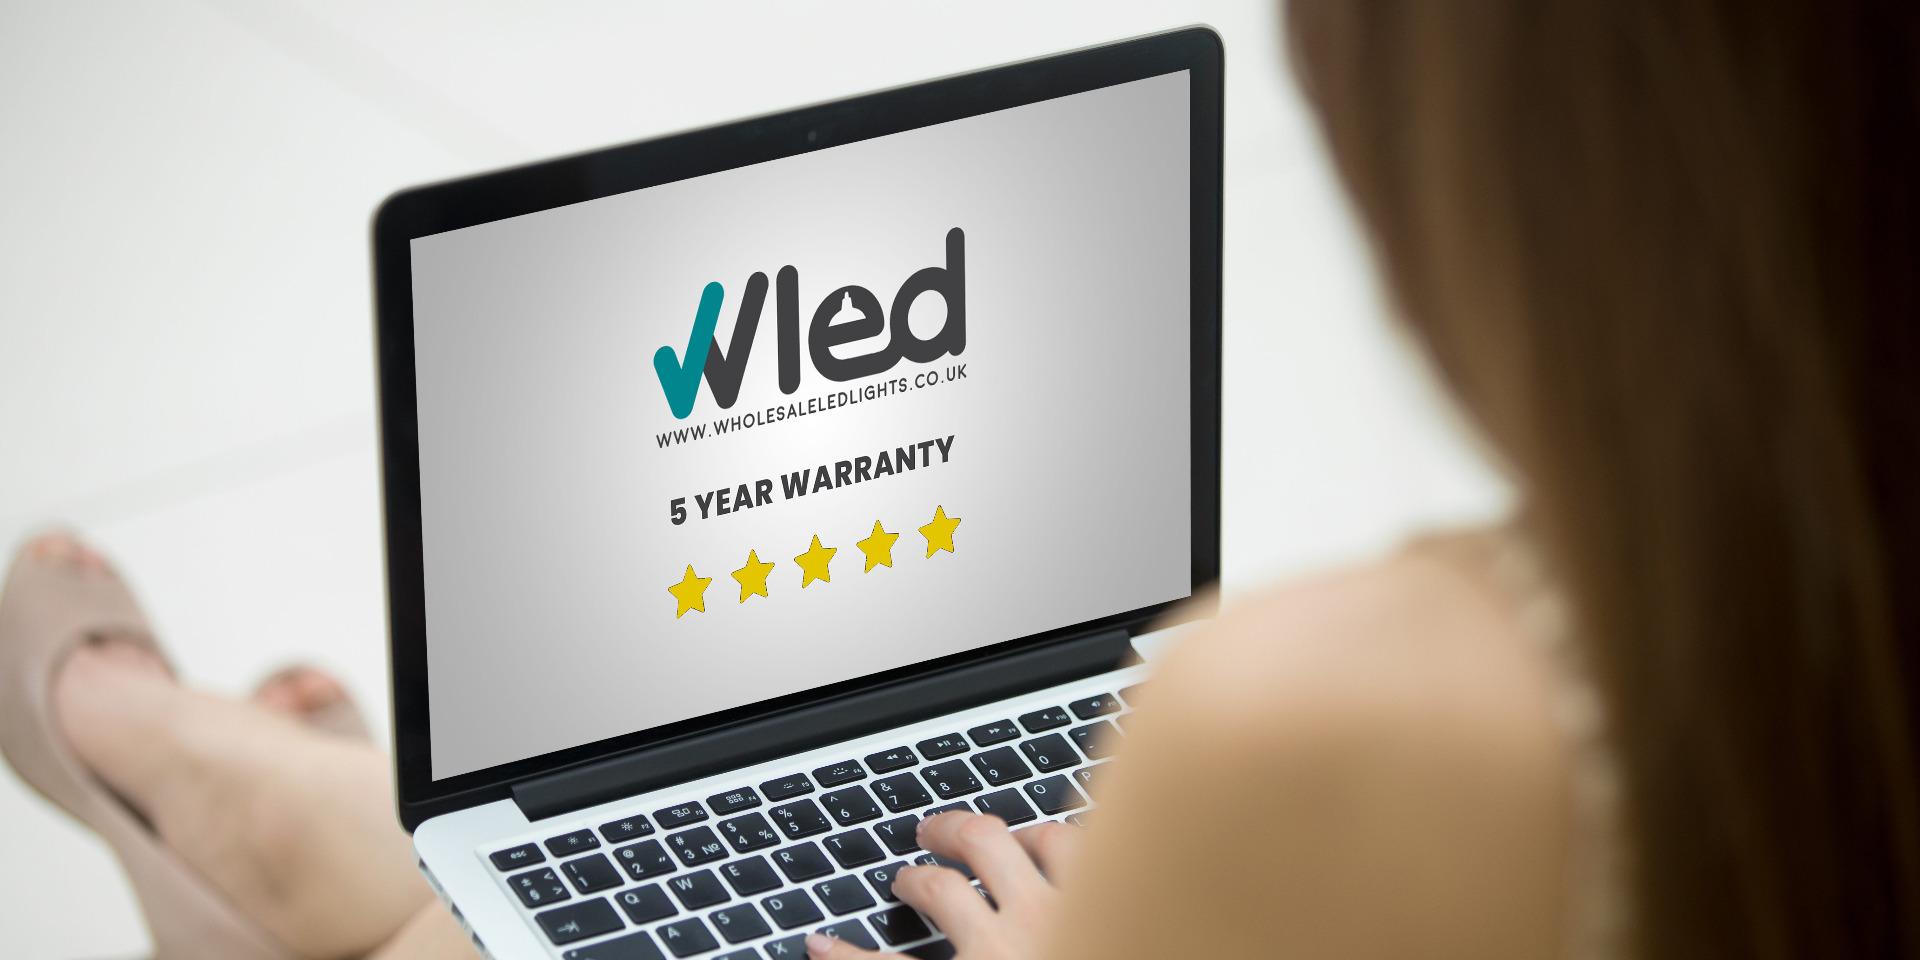 WLED 5 Year Warranty